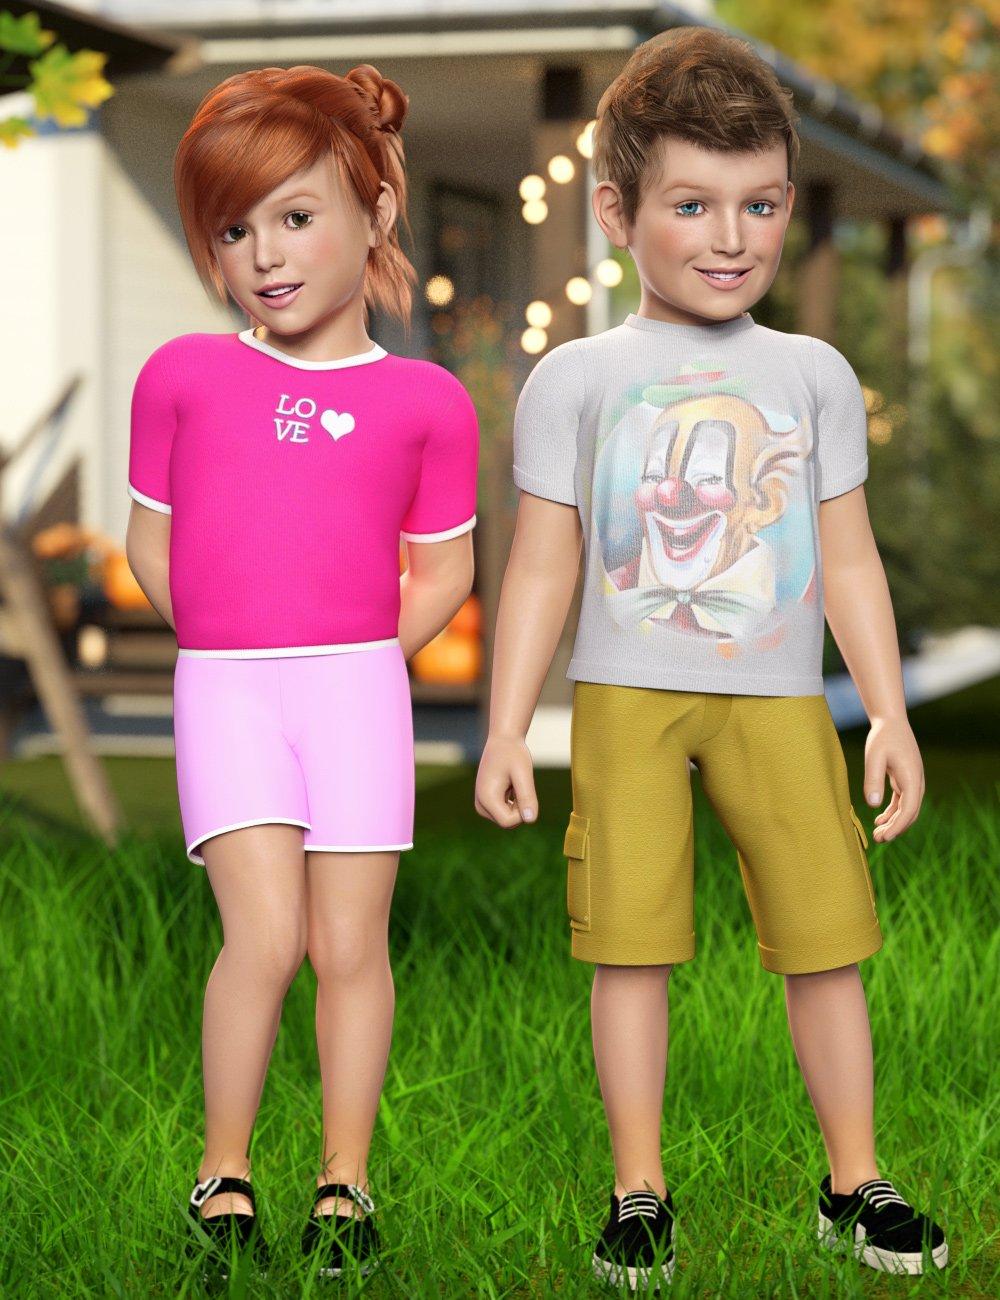 The Kids 4 Base by: joelegeckomutedbanshee, 3D Models by Daz 3D